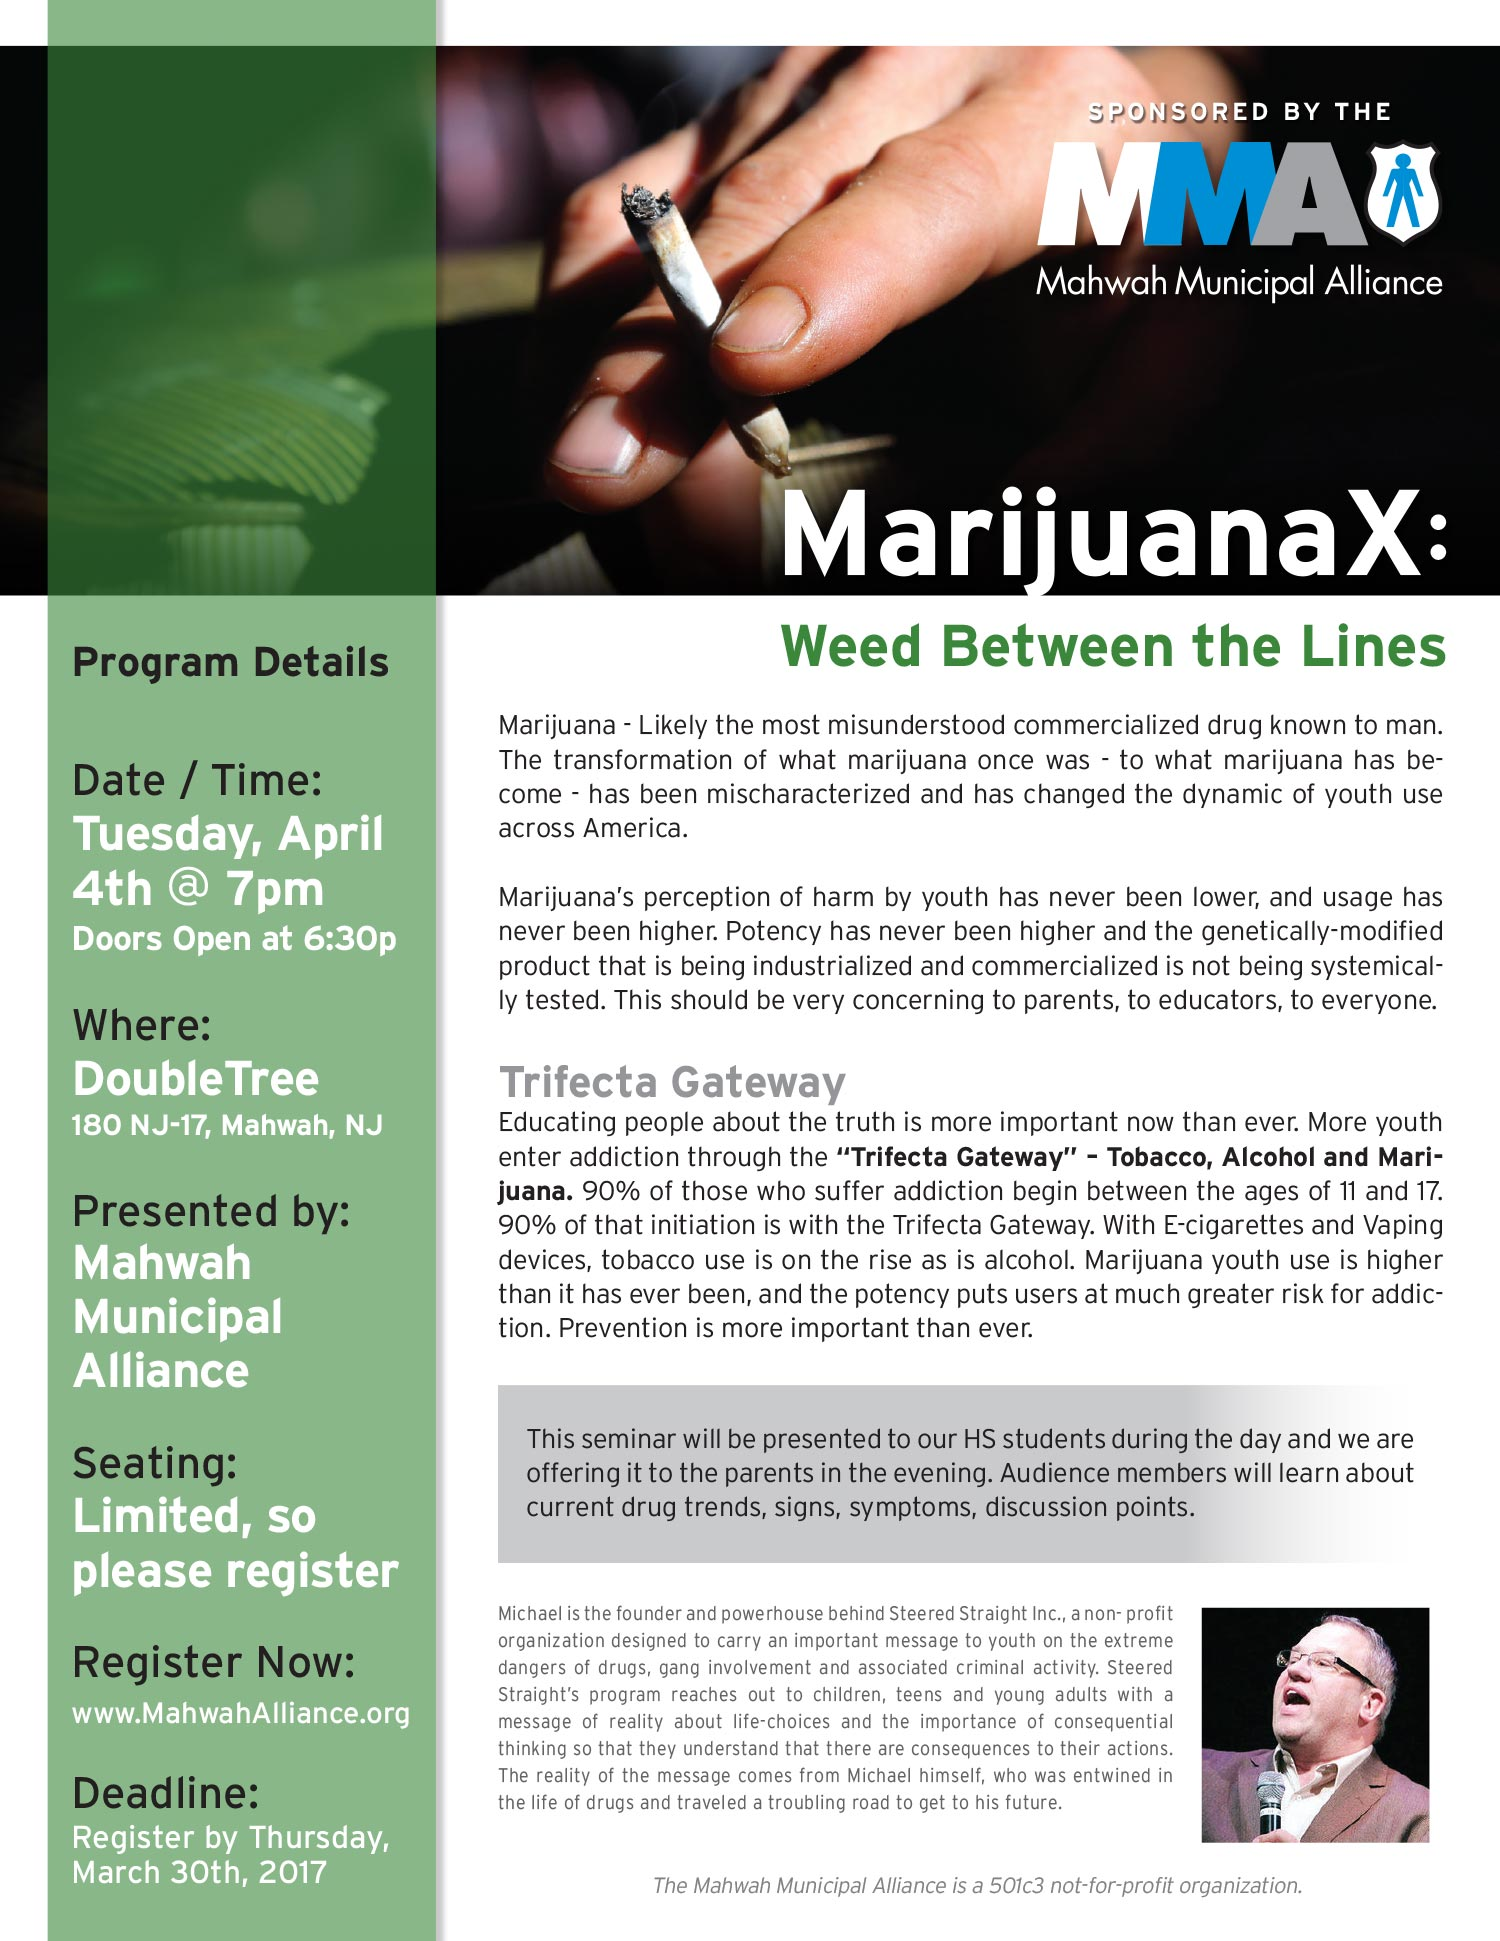 MMA-MarijuanaX-Flyer-3-17.jpg